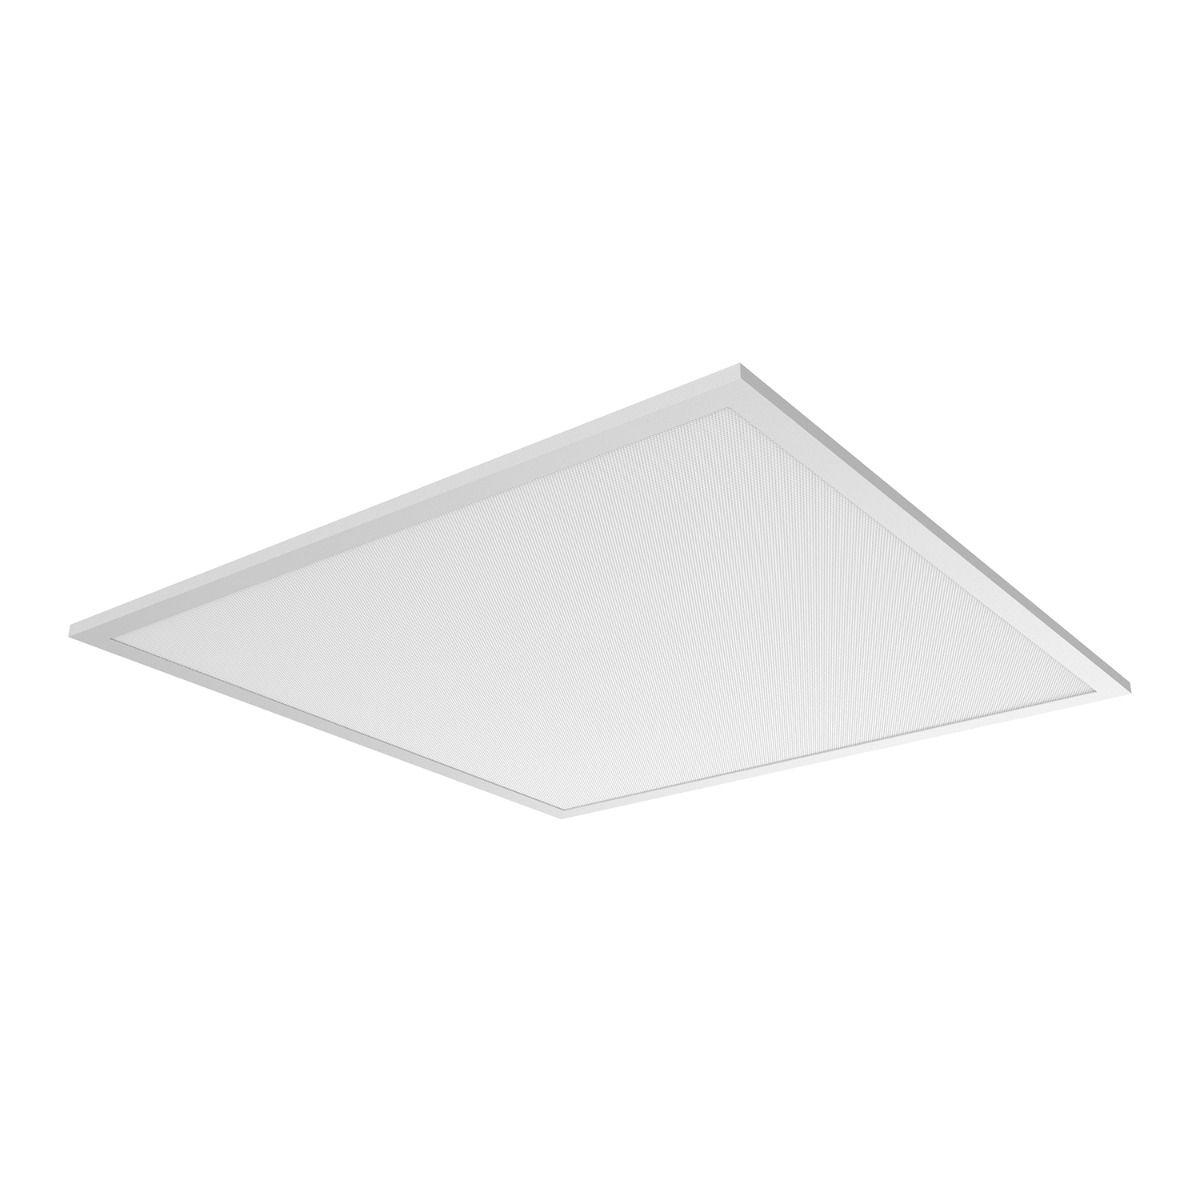 Noxion LED Panel Delta Pro V3 Highlum DALI 36W 4000K 5500lm 60x60cm UGR <19 | Cool White - Replaces 4x18W